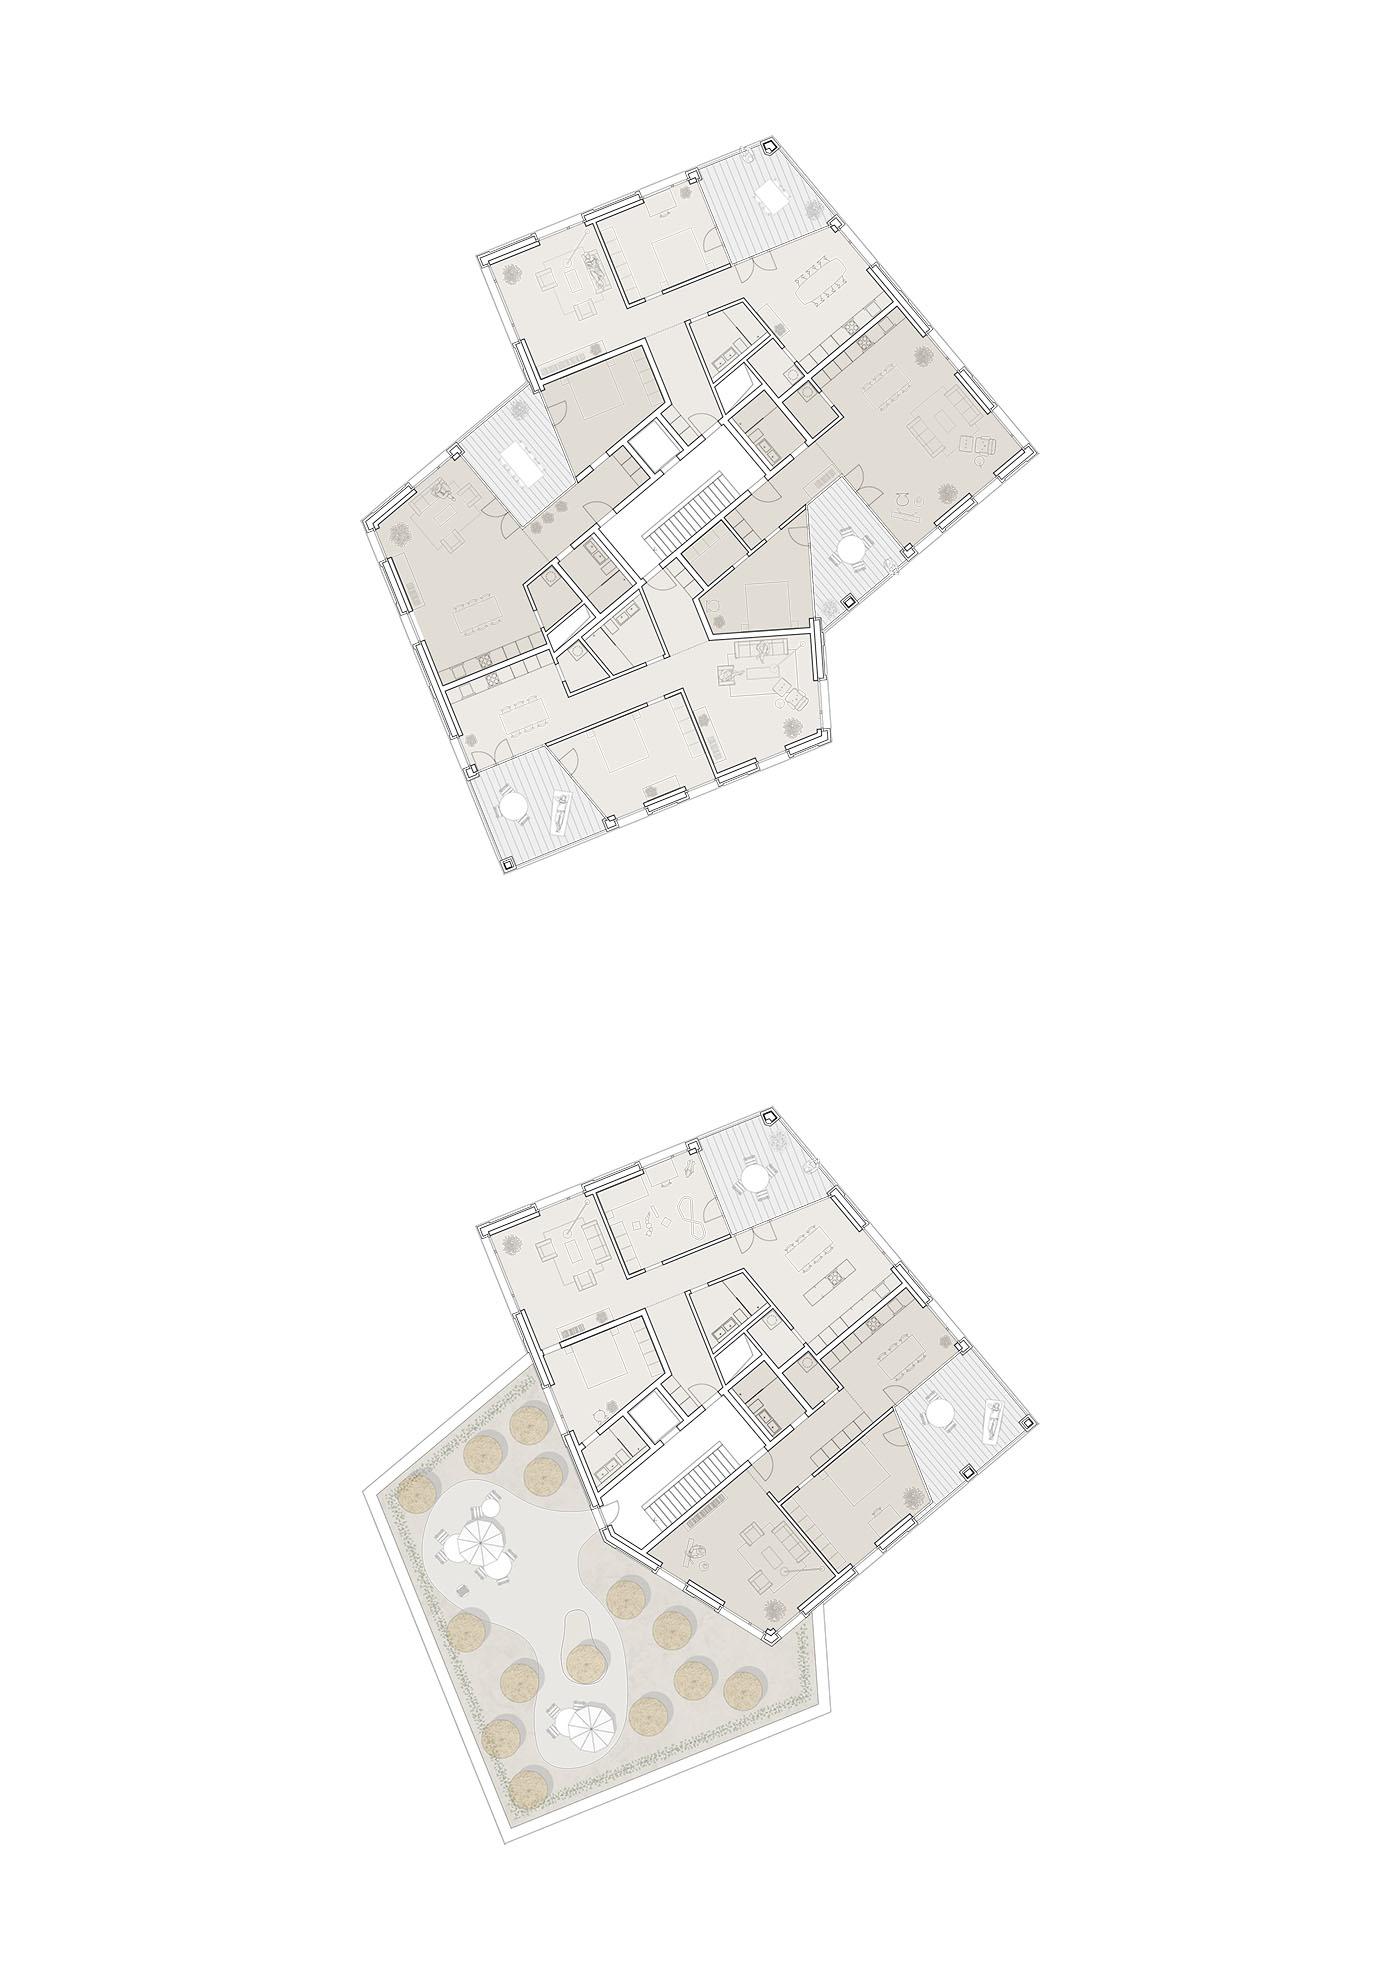 buan architekten – Studienauftrag Kanzlei-Kreisel Emmenbrücke – 2.+4.Obergeschoss